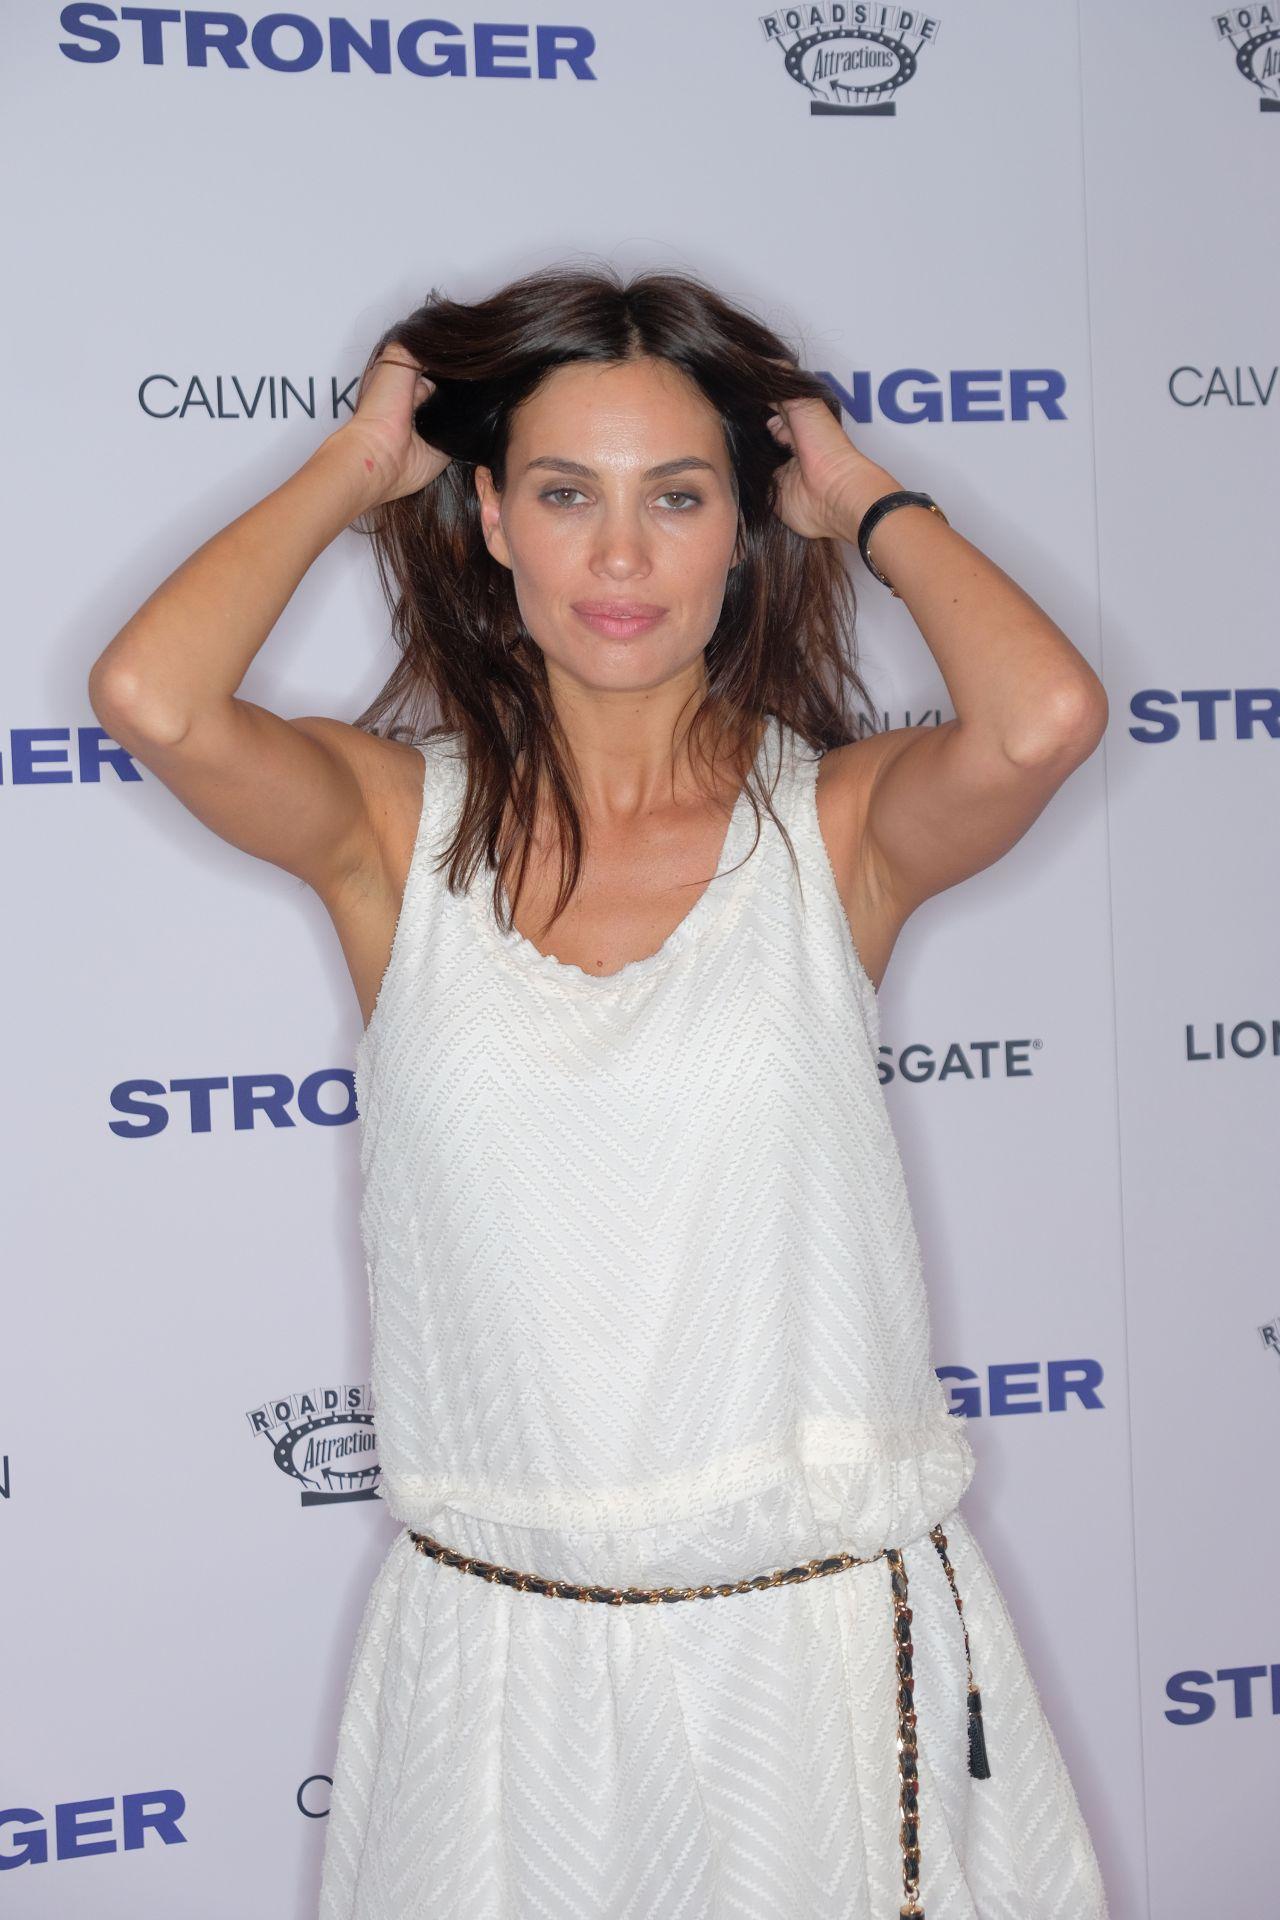 Fappening Cleavage Alina Puscau  nudes (91 fotos), Snapchat, underwear